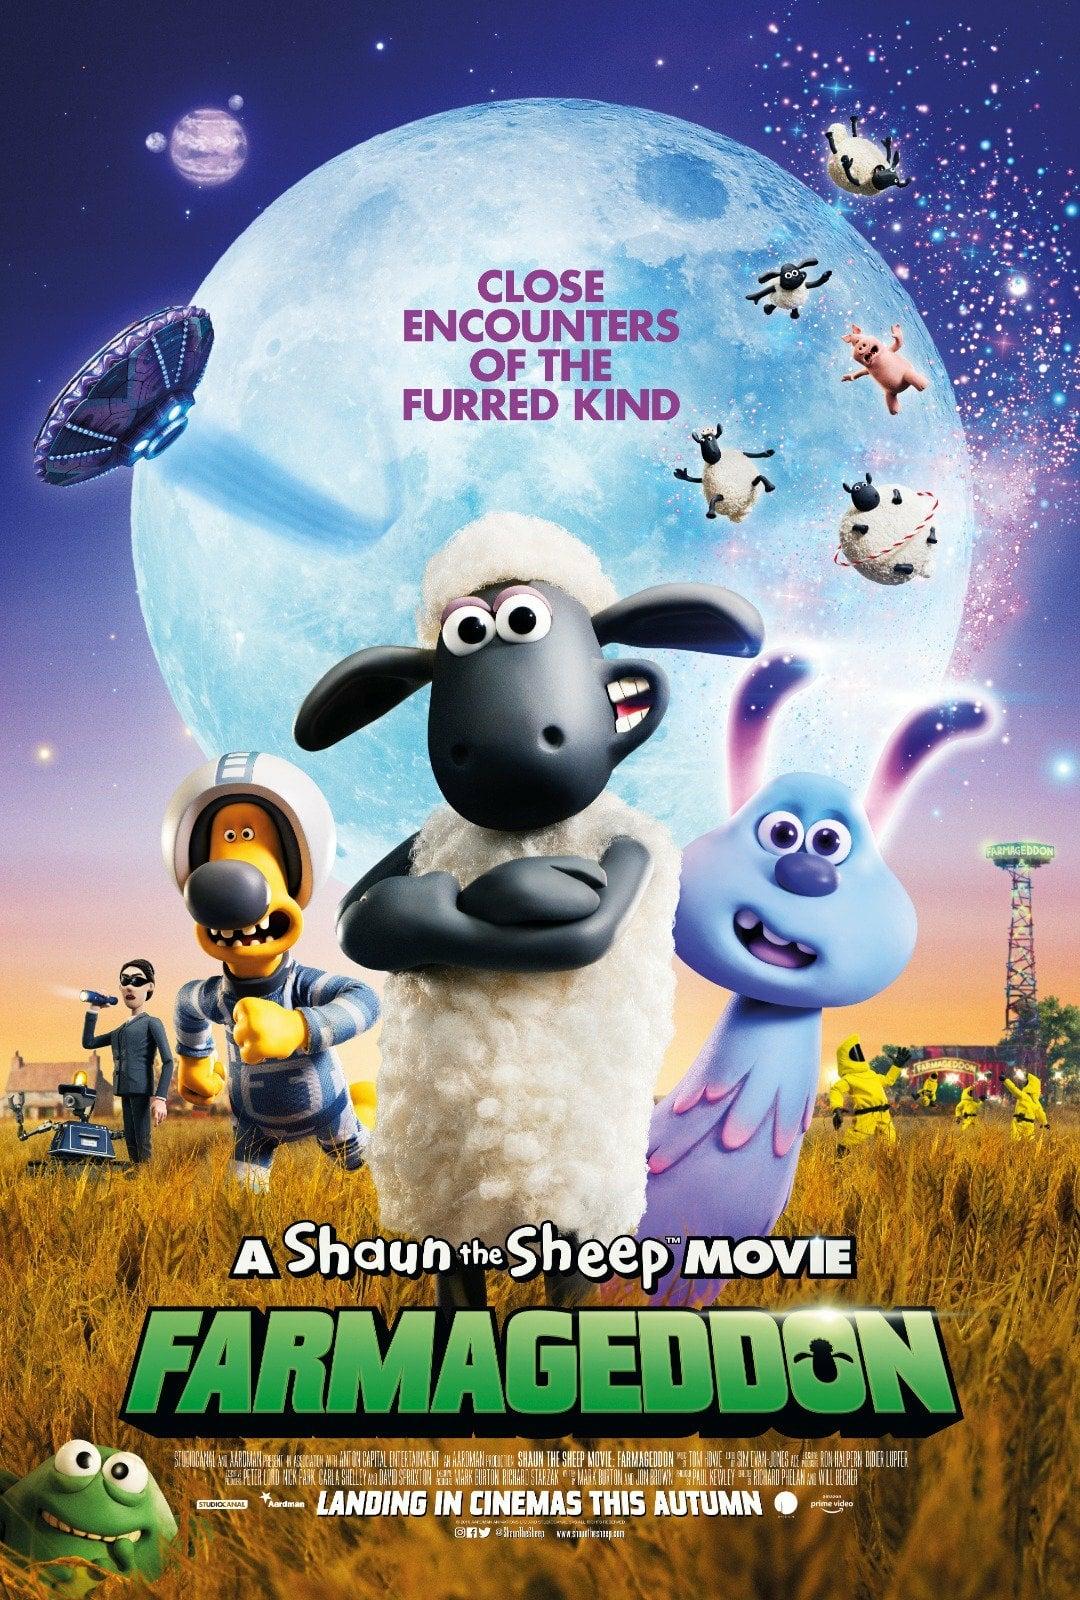 A Shaun the Sheep Movie: Farmageddon poster